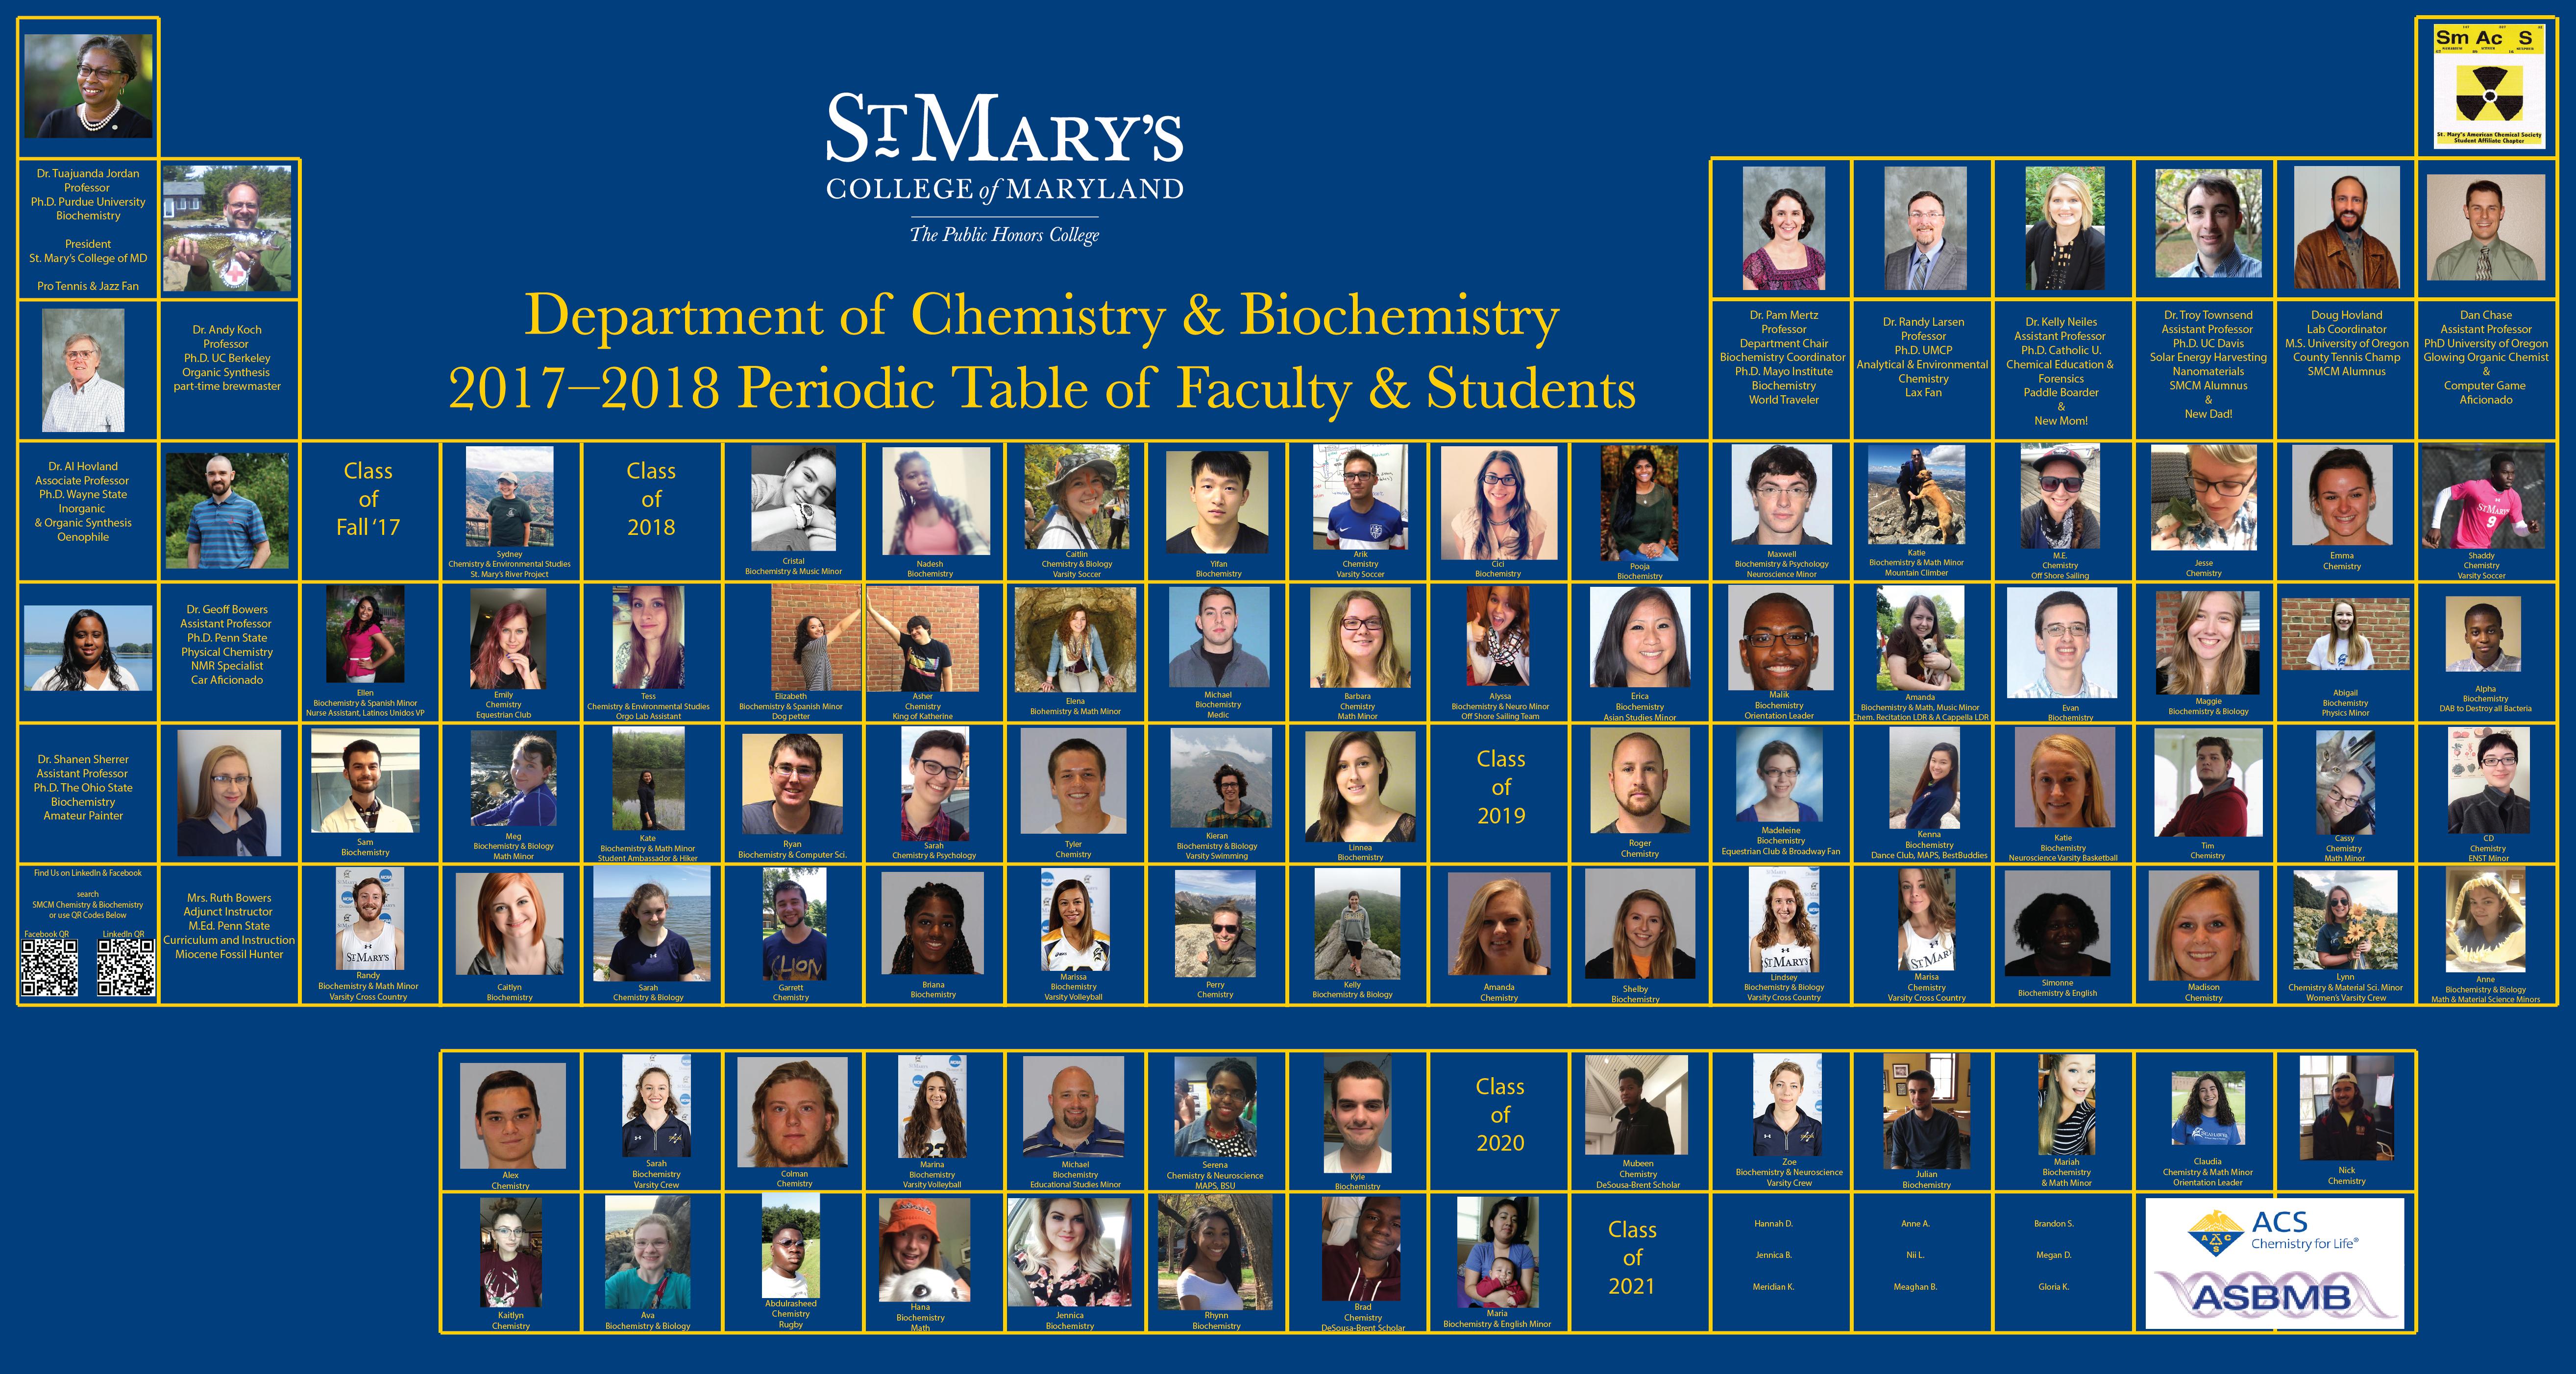 Department of Chemistry & Biochemistry - Chemistry & Biochemistry